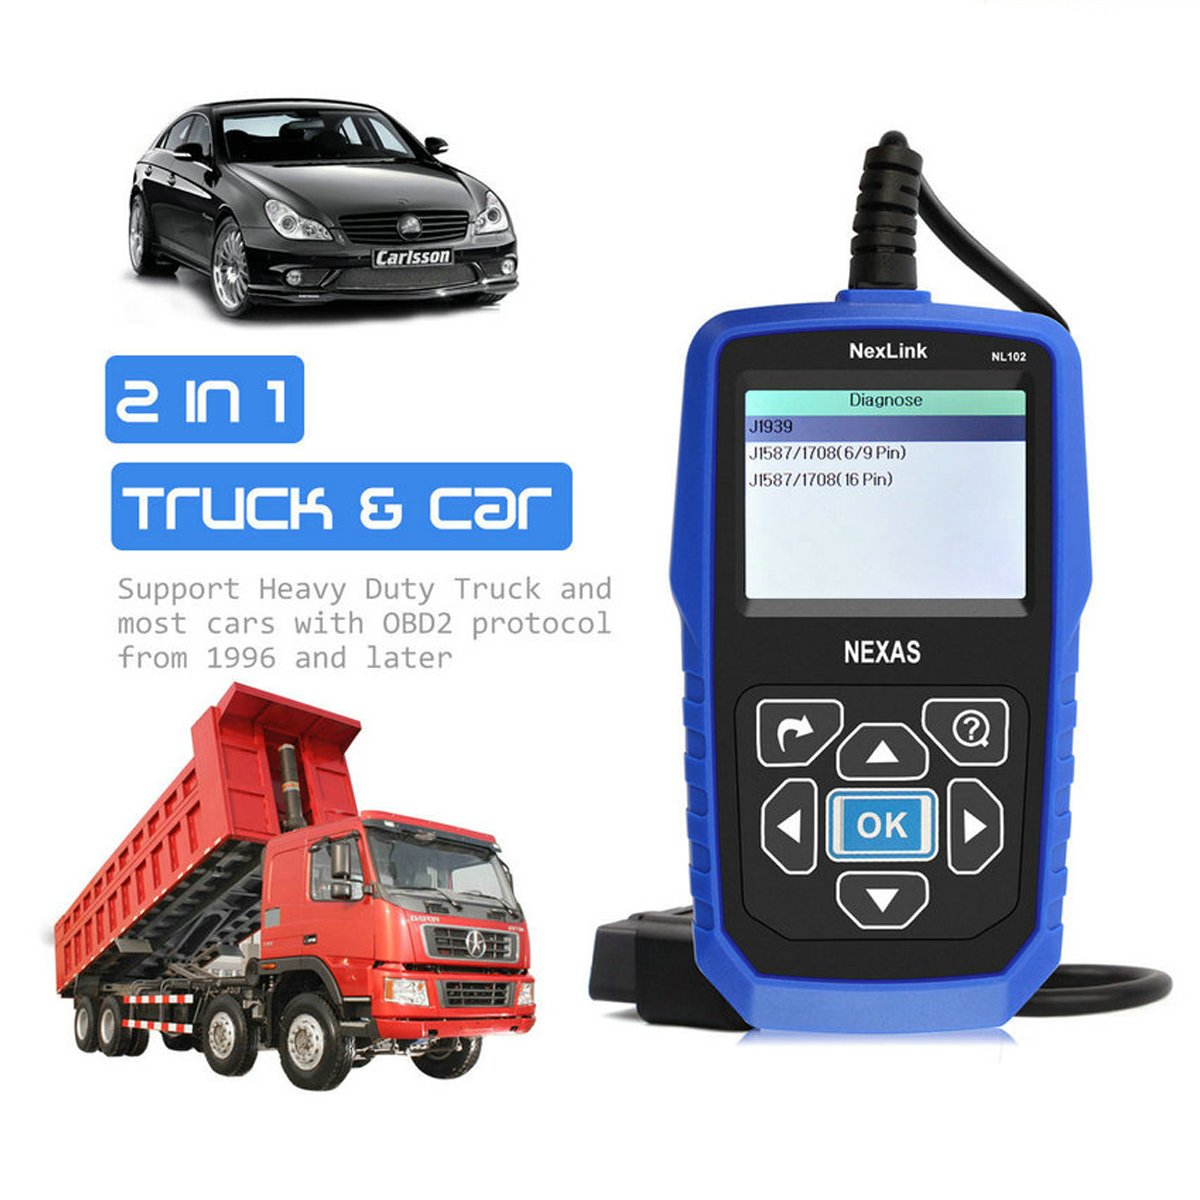 Amazon.com: NEXAS Heavy Duty Truck Scanner NL102 OBD/EOBD+HDOBD Diagnostic  Scanner Scan Tools Engine ABS Transmission Check Trucks & Cars 2 In 1 Codes  ...